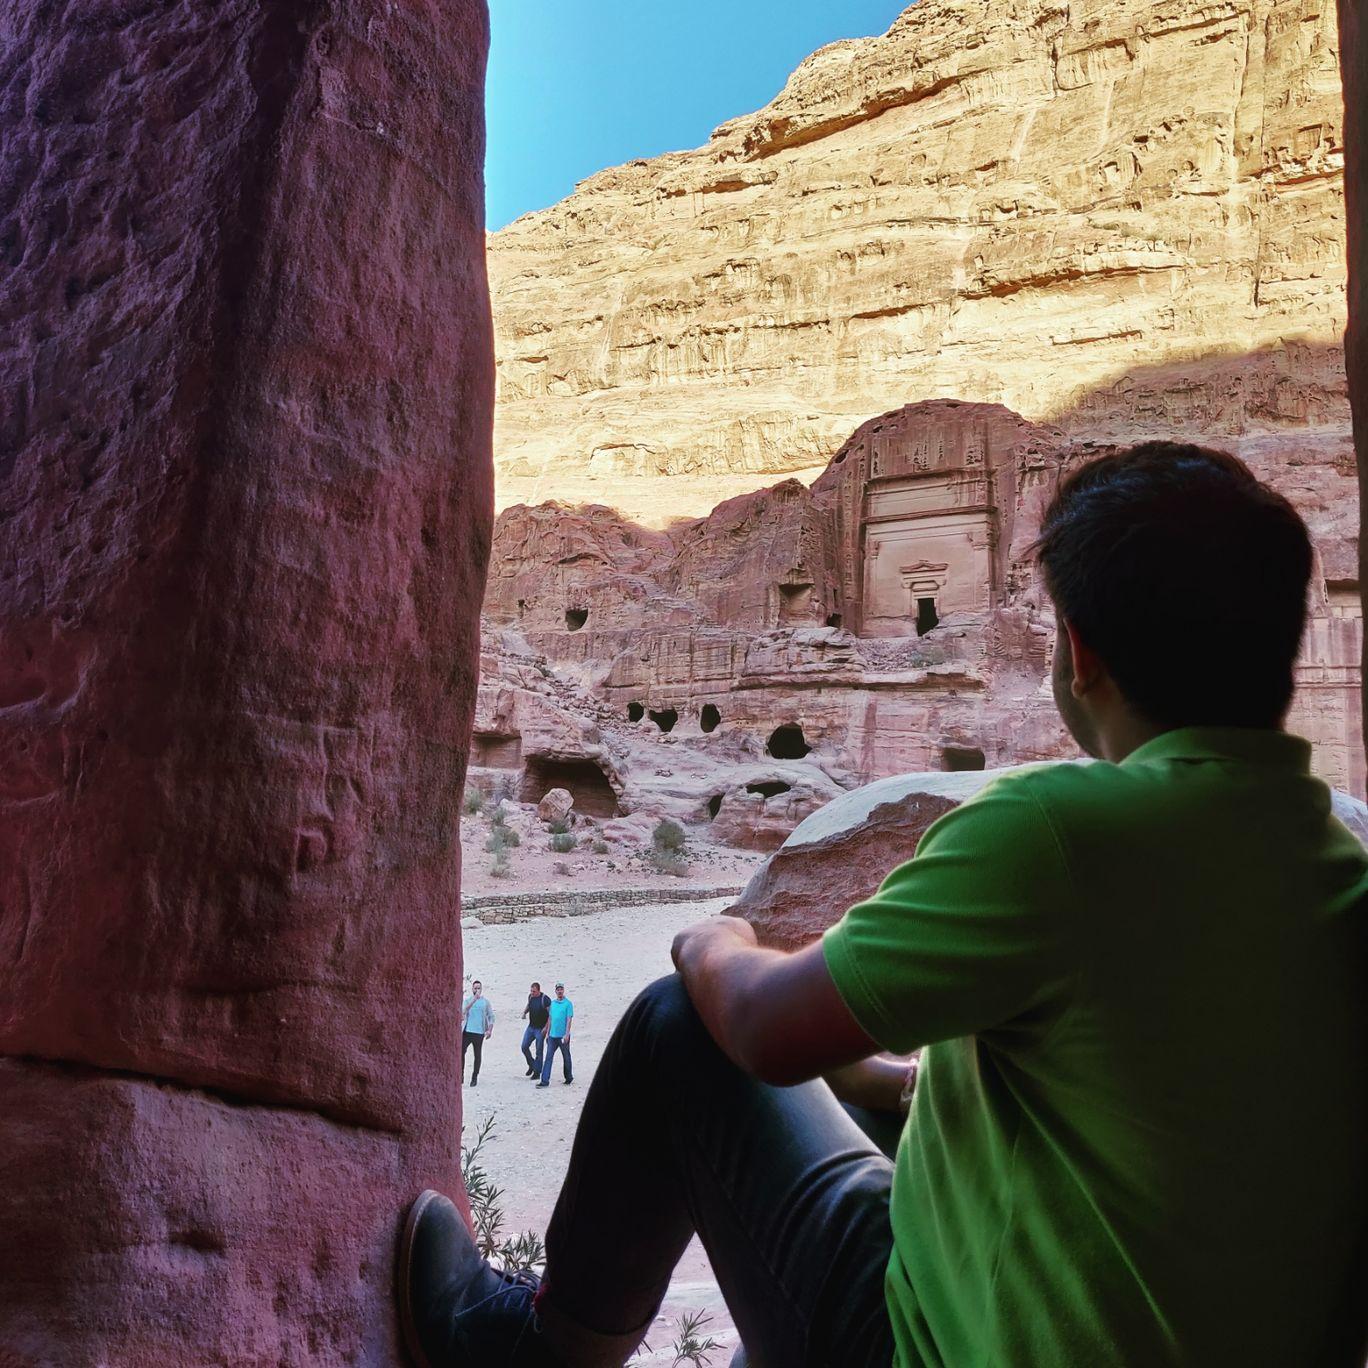 Photo of Jordan By Krishnangshu Das